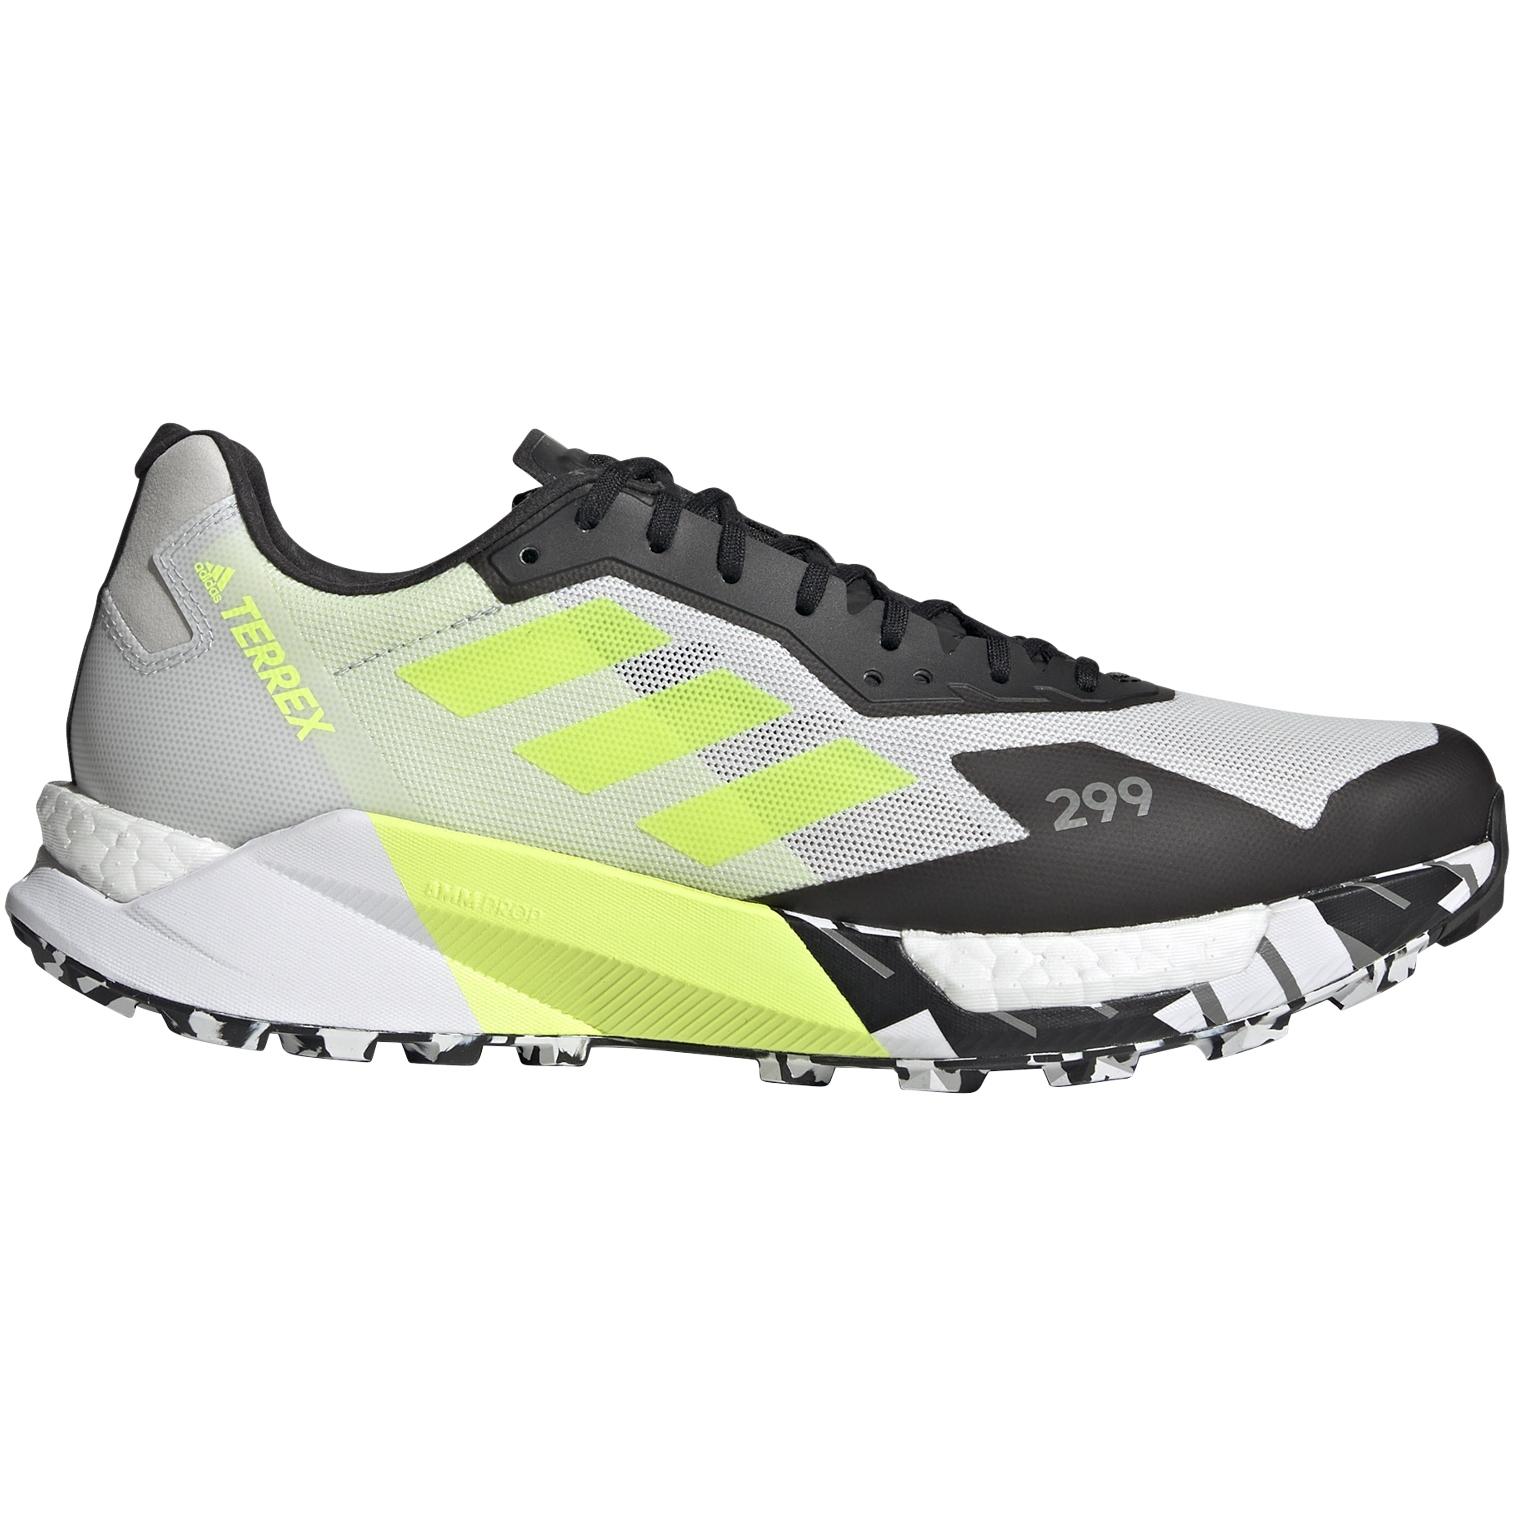 adidas TERREX Agravic Ultra Trailrunning Zapatillas para Hombre - ftwr white/grey two/core black FY7629